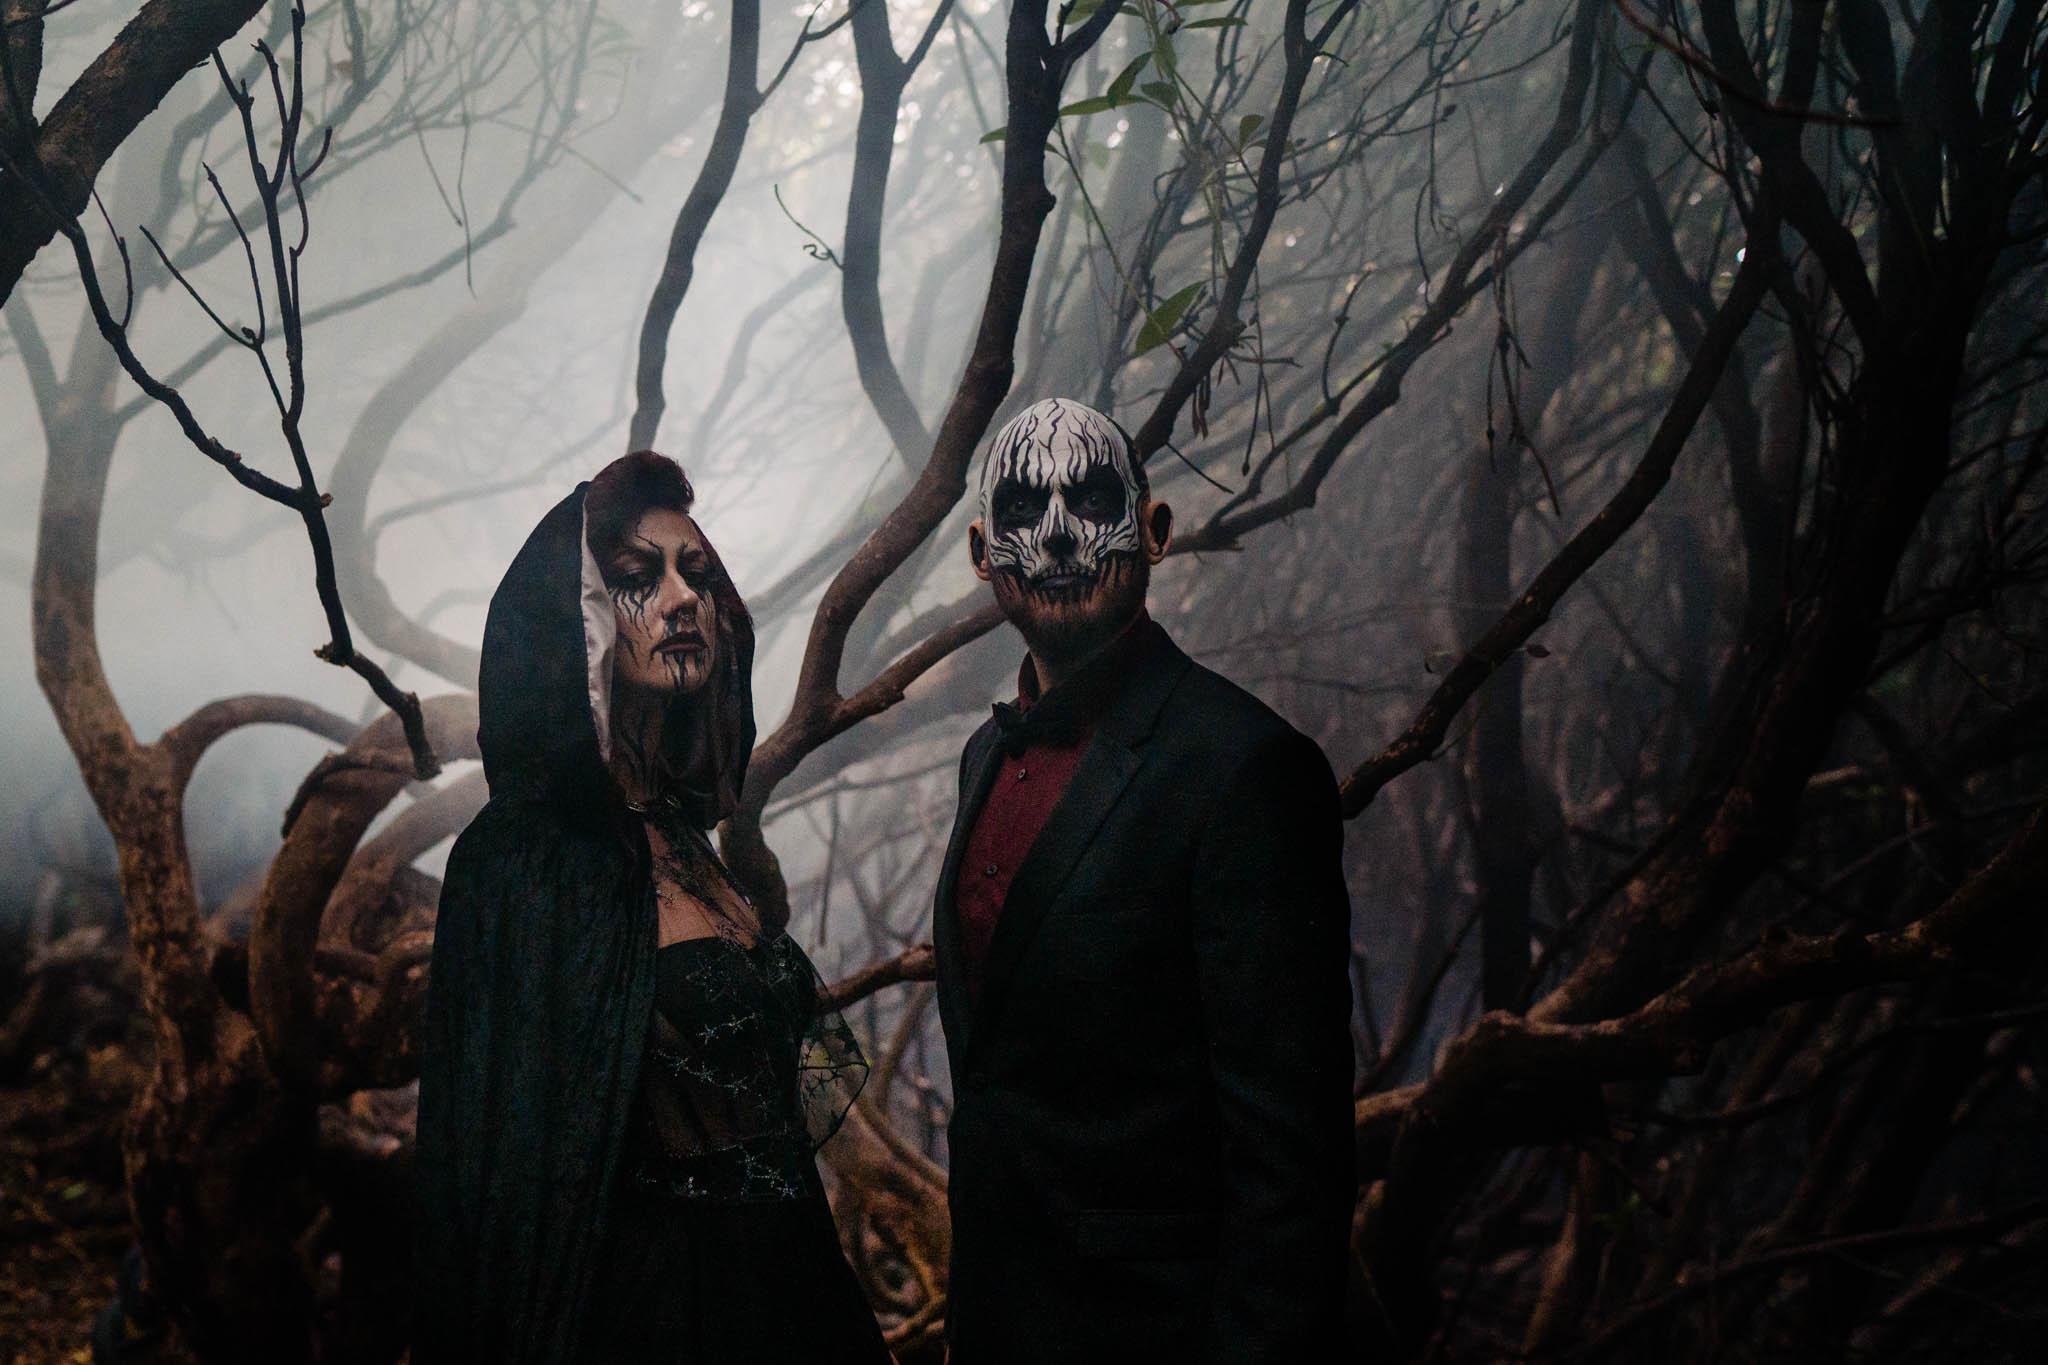 gothic wedding - halloween wedding - spooky wedding photos - bride and groom with halloween face paint